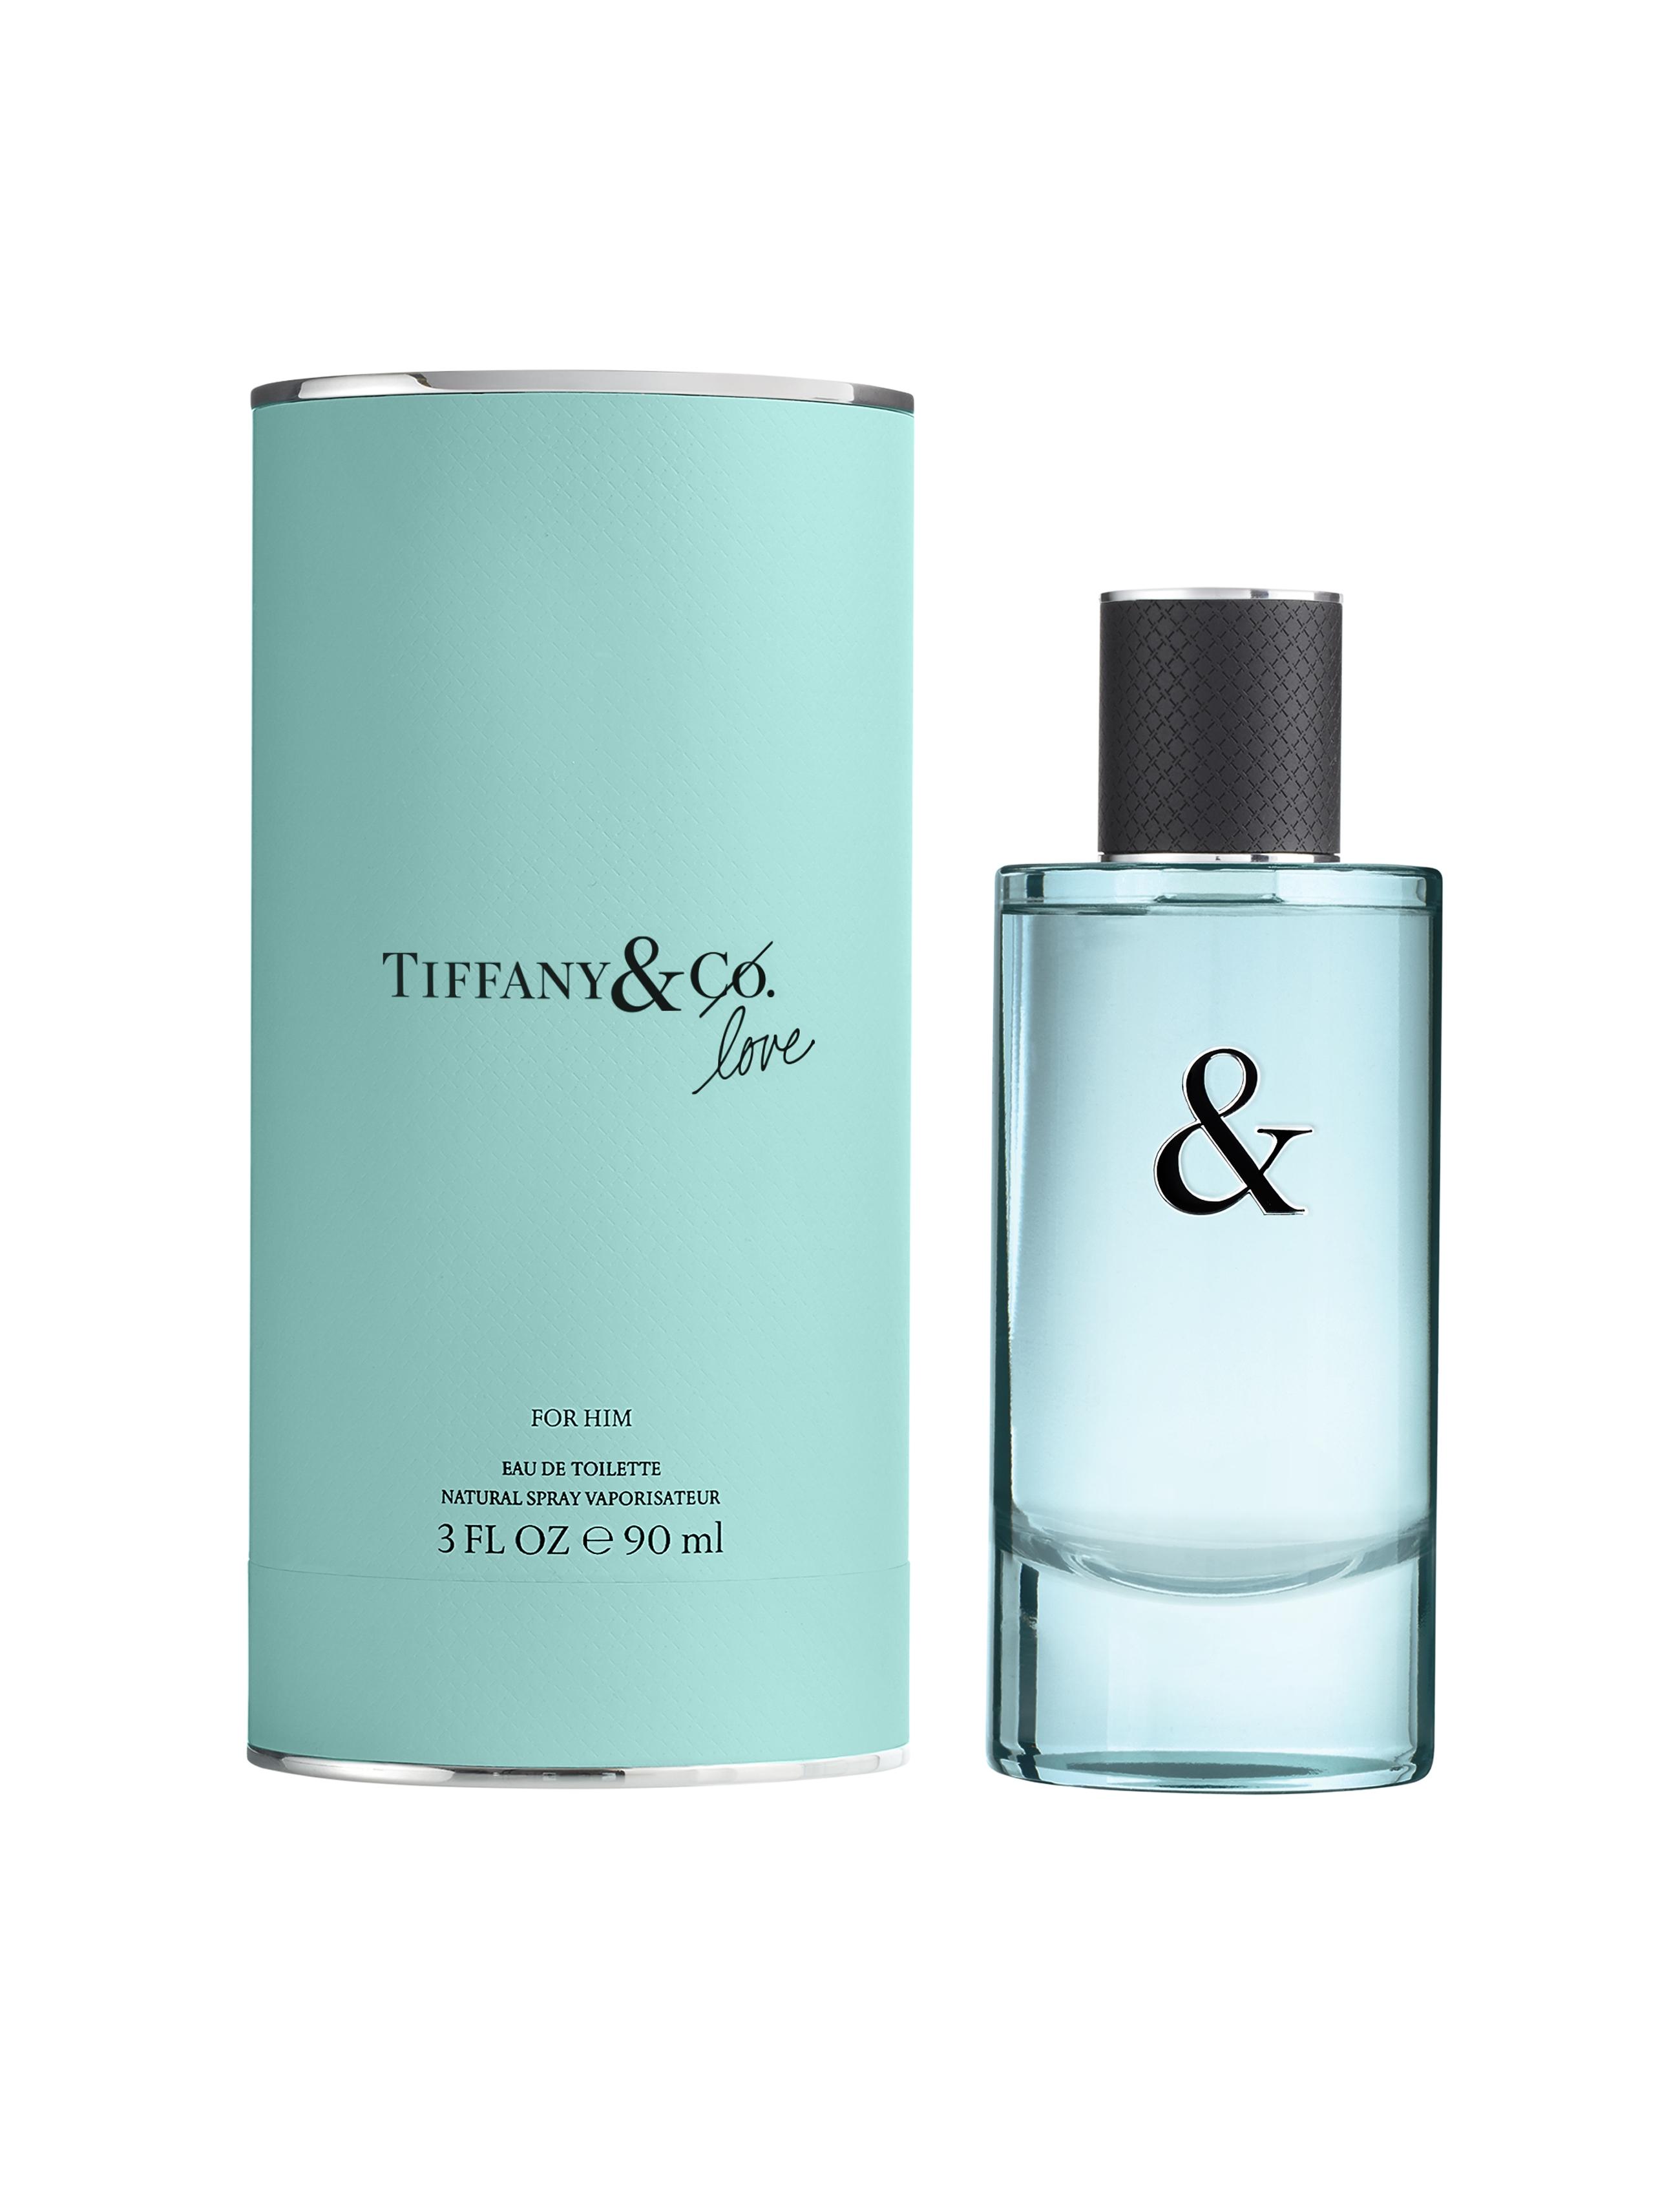 Tiffany & Co Love Him EDT, 90 ml